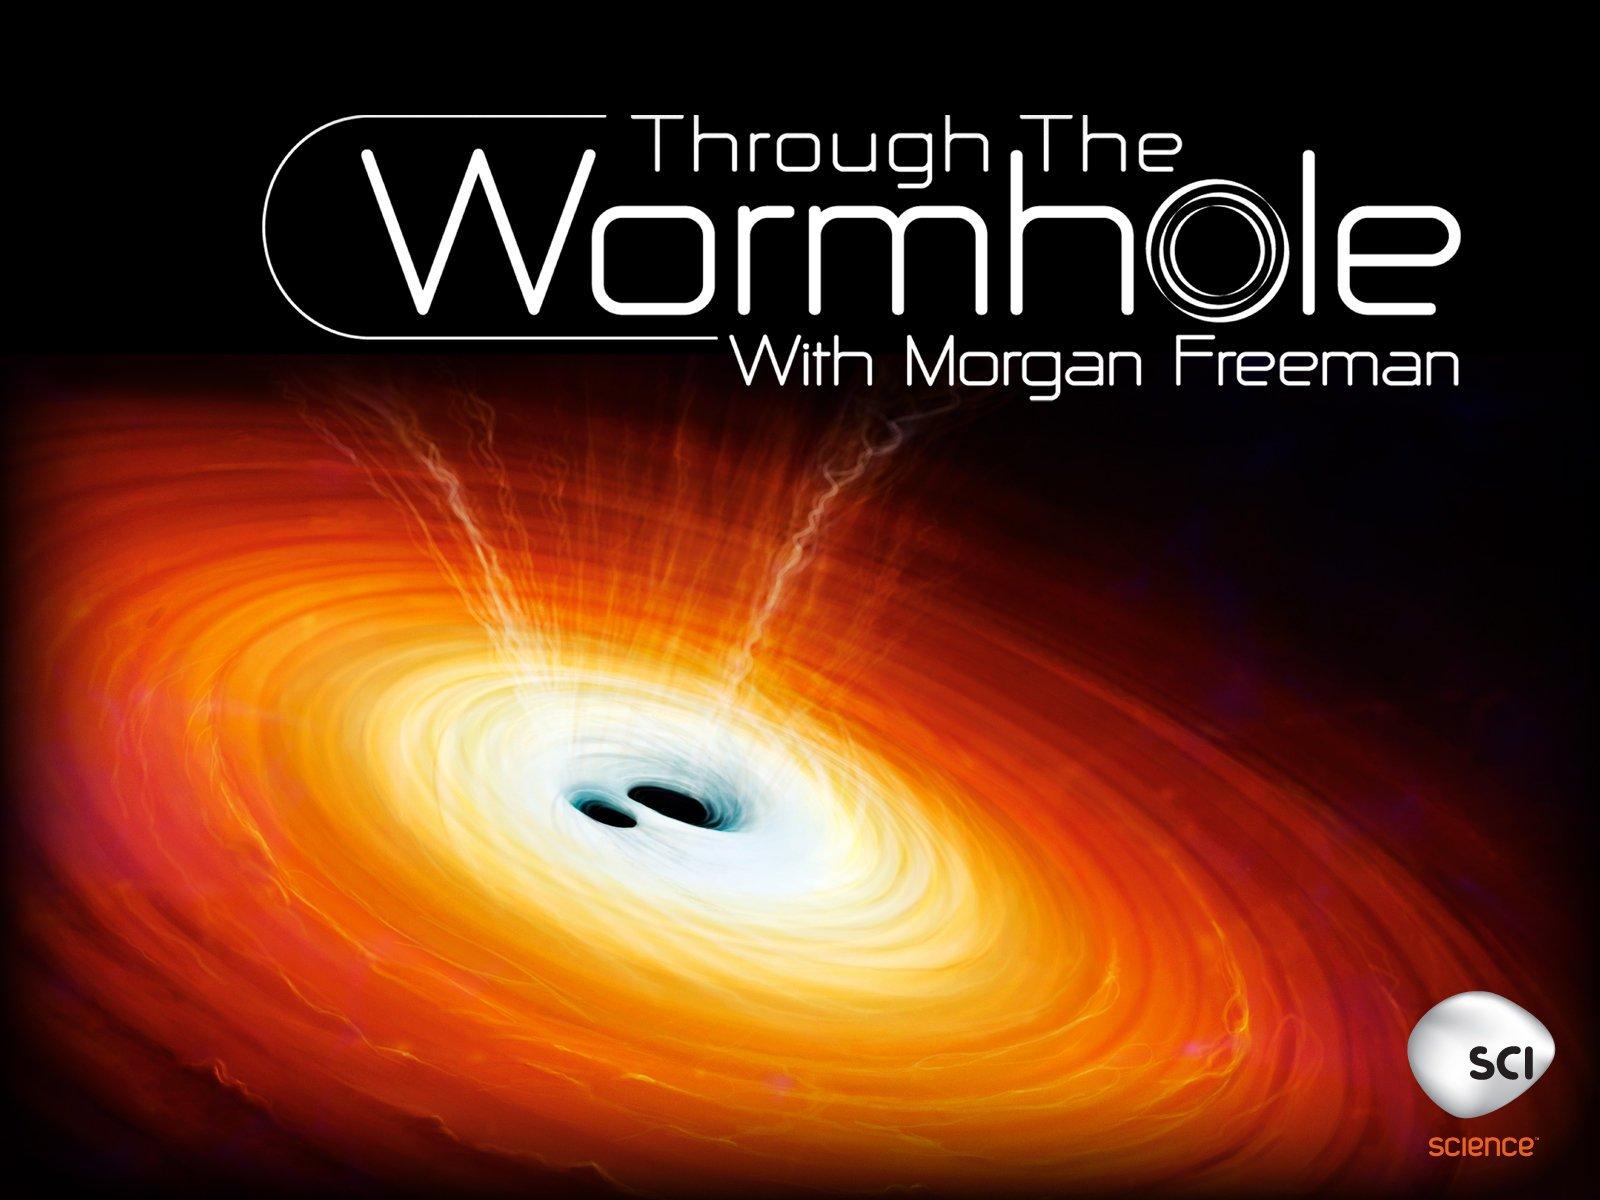 through the wormhole season 7 episode 3